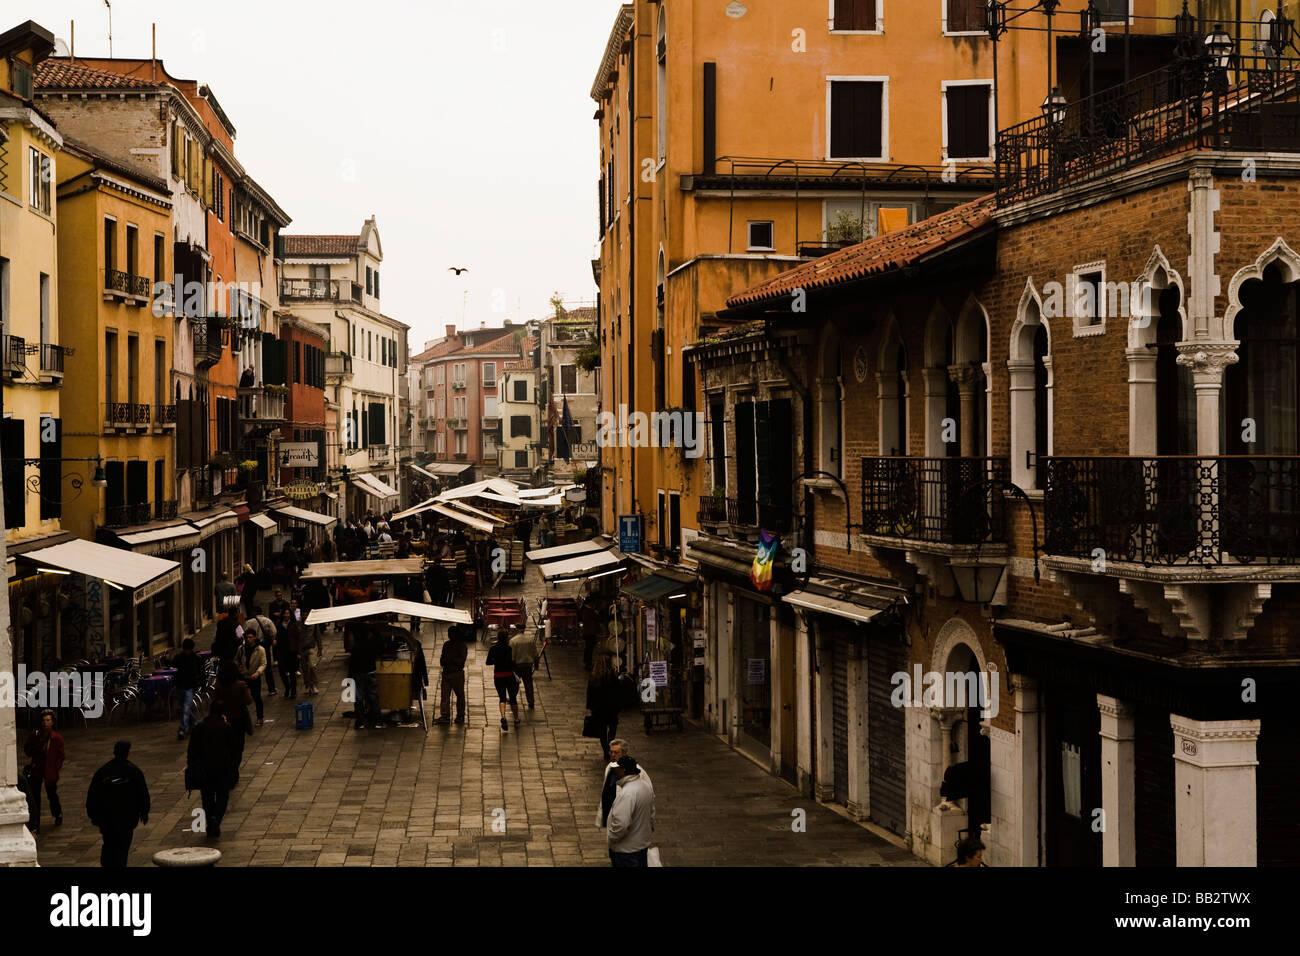 Venice street scene; Italy Stock Photo - Alamy